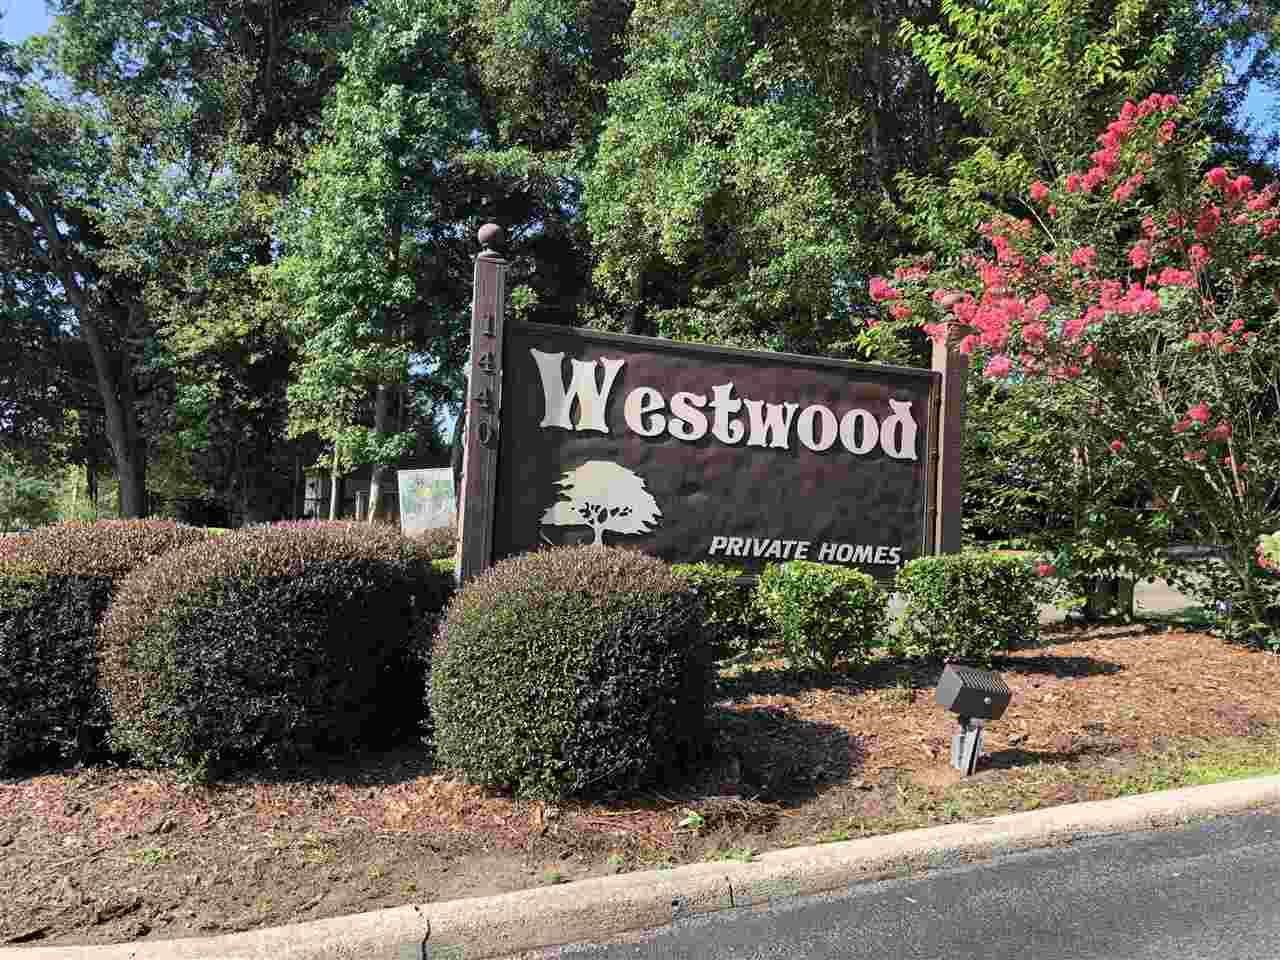 Photo of 407 A Westwood Drive, TALLAHASSEE, FL 32303 (MLS # 335359)